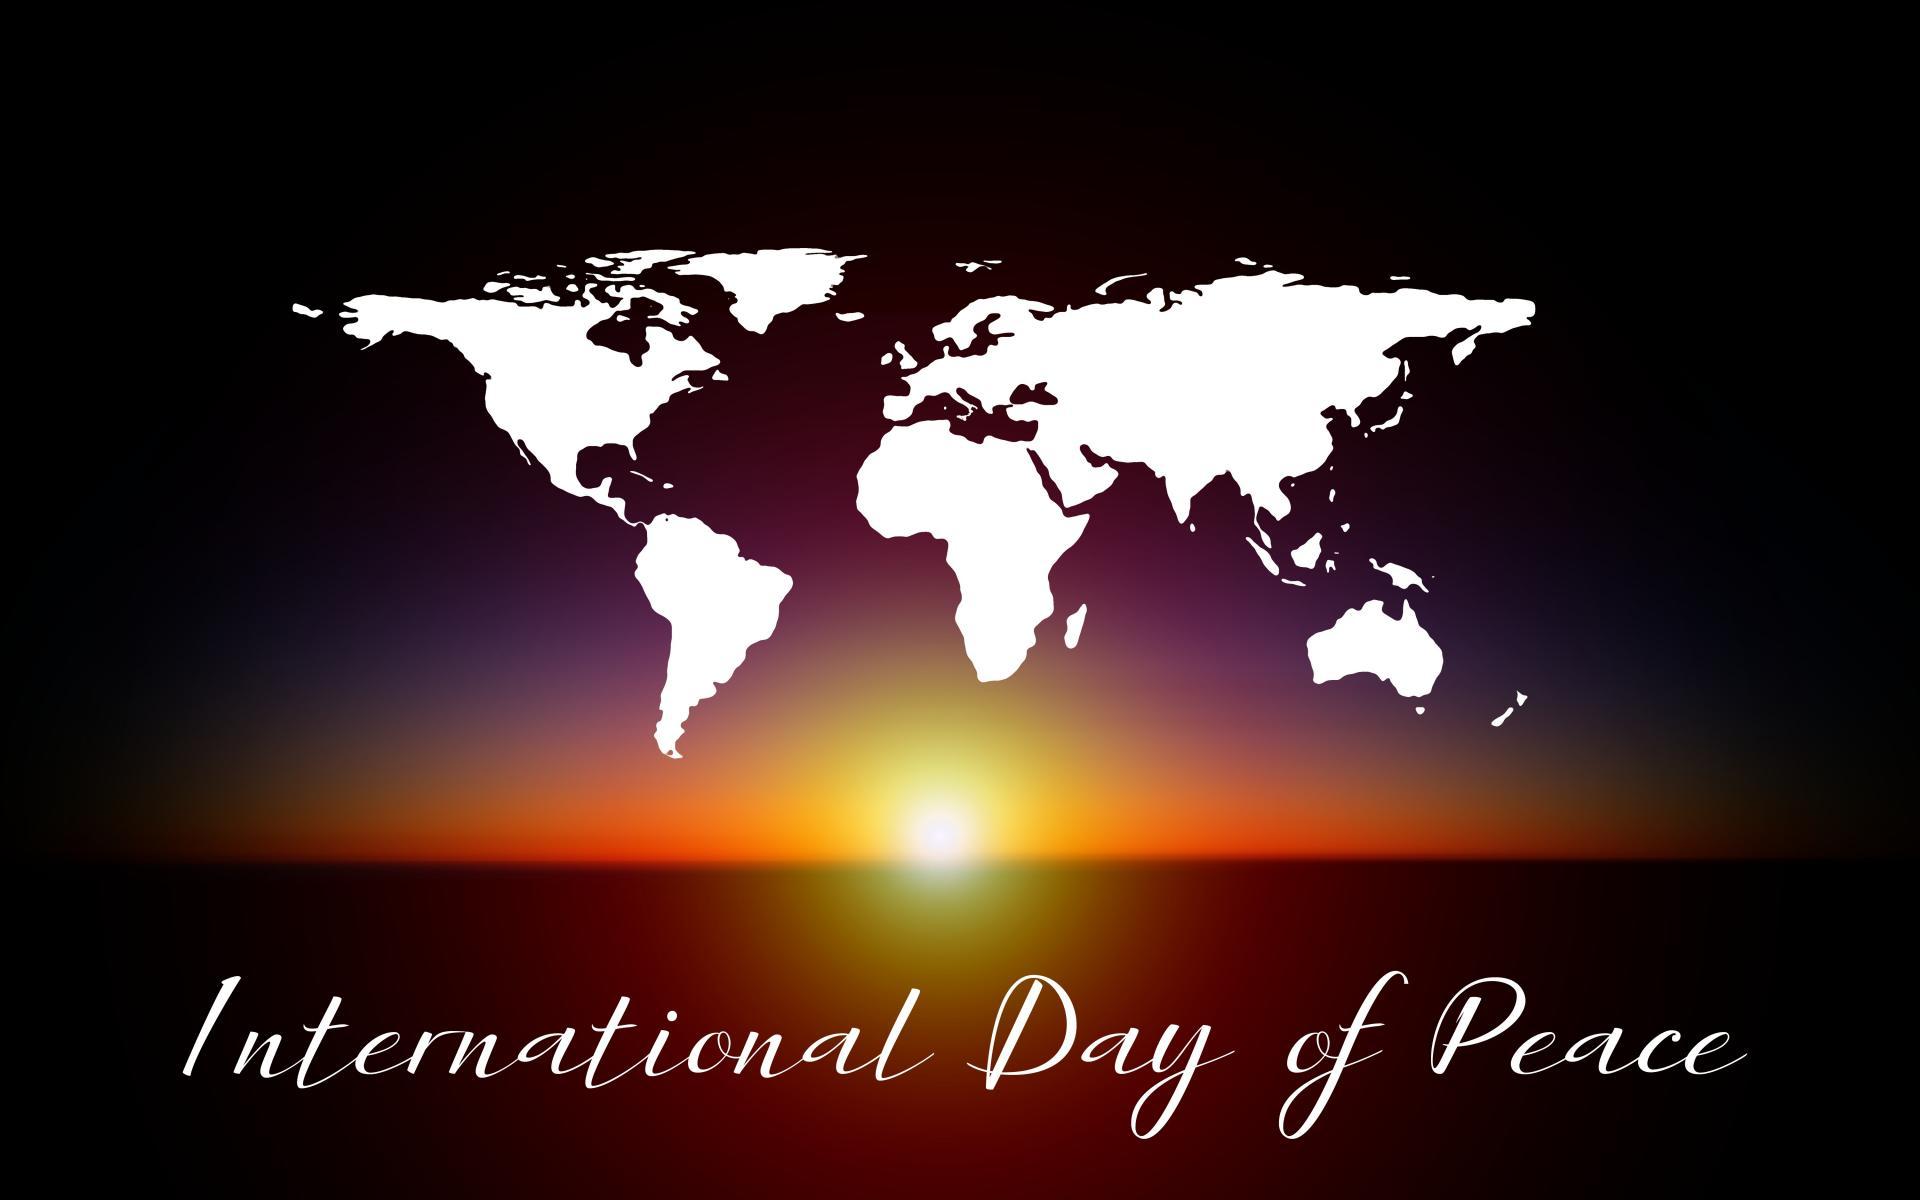 International Day of Peace Wallpaper 11   6000 X 4000 stmednet 1920x1200